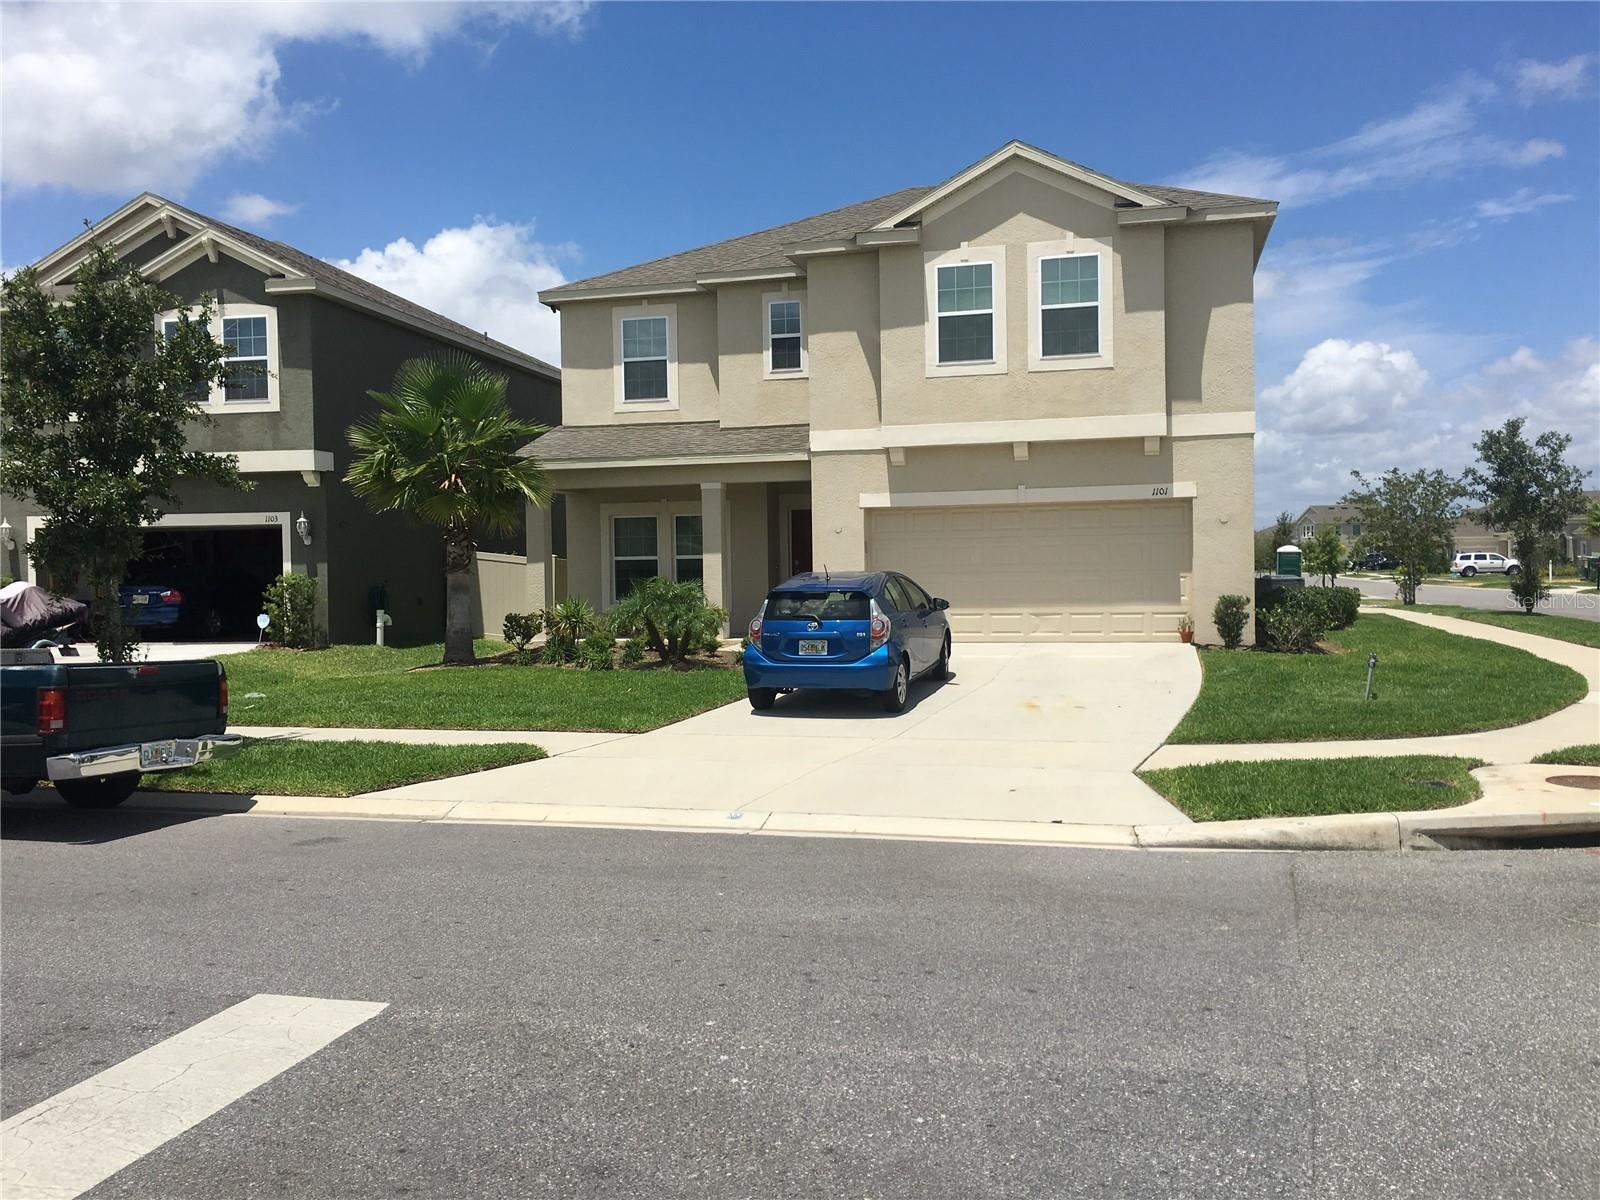 1101 WHITE WATER BAY DRIVE, Groveland, FL 34736 - #: G5046442